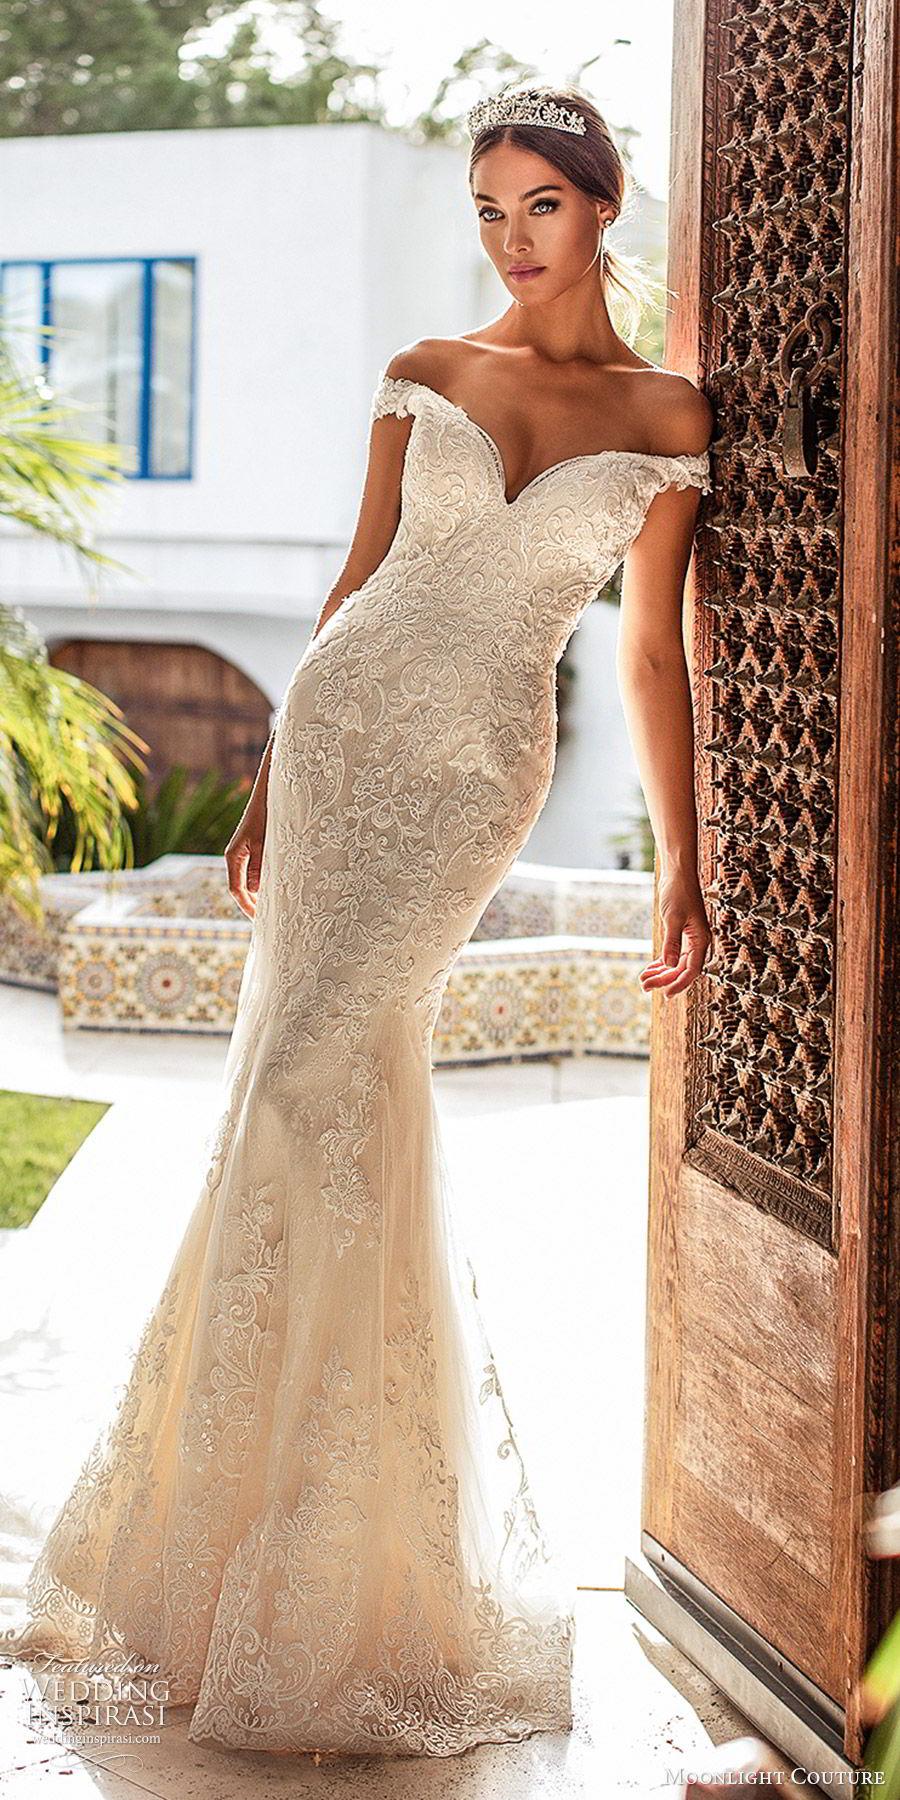 moonlight couture fall 2019 bridal off shoulder sweetheart neckline fully embellished lace mermaid sheath wedding dress (2) elegant glam romantic chapel train mv